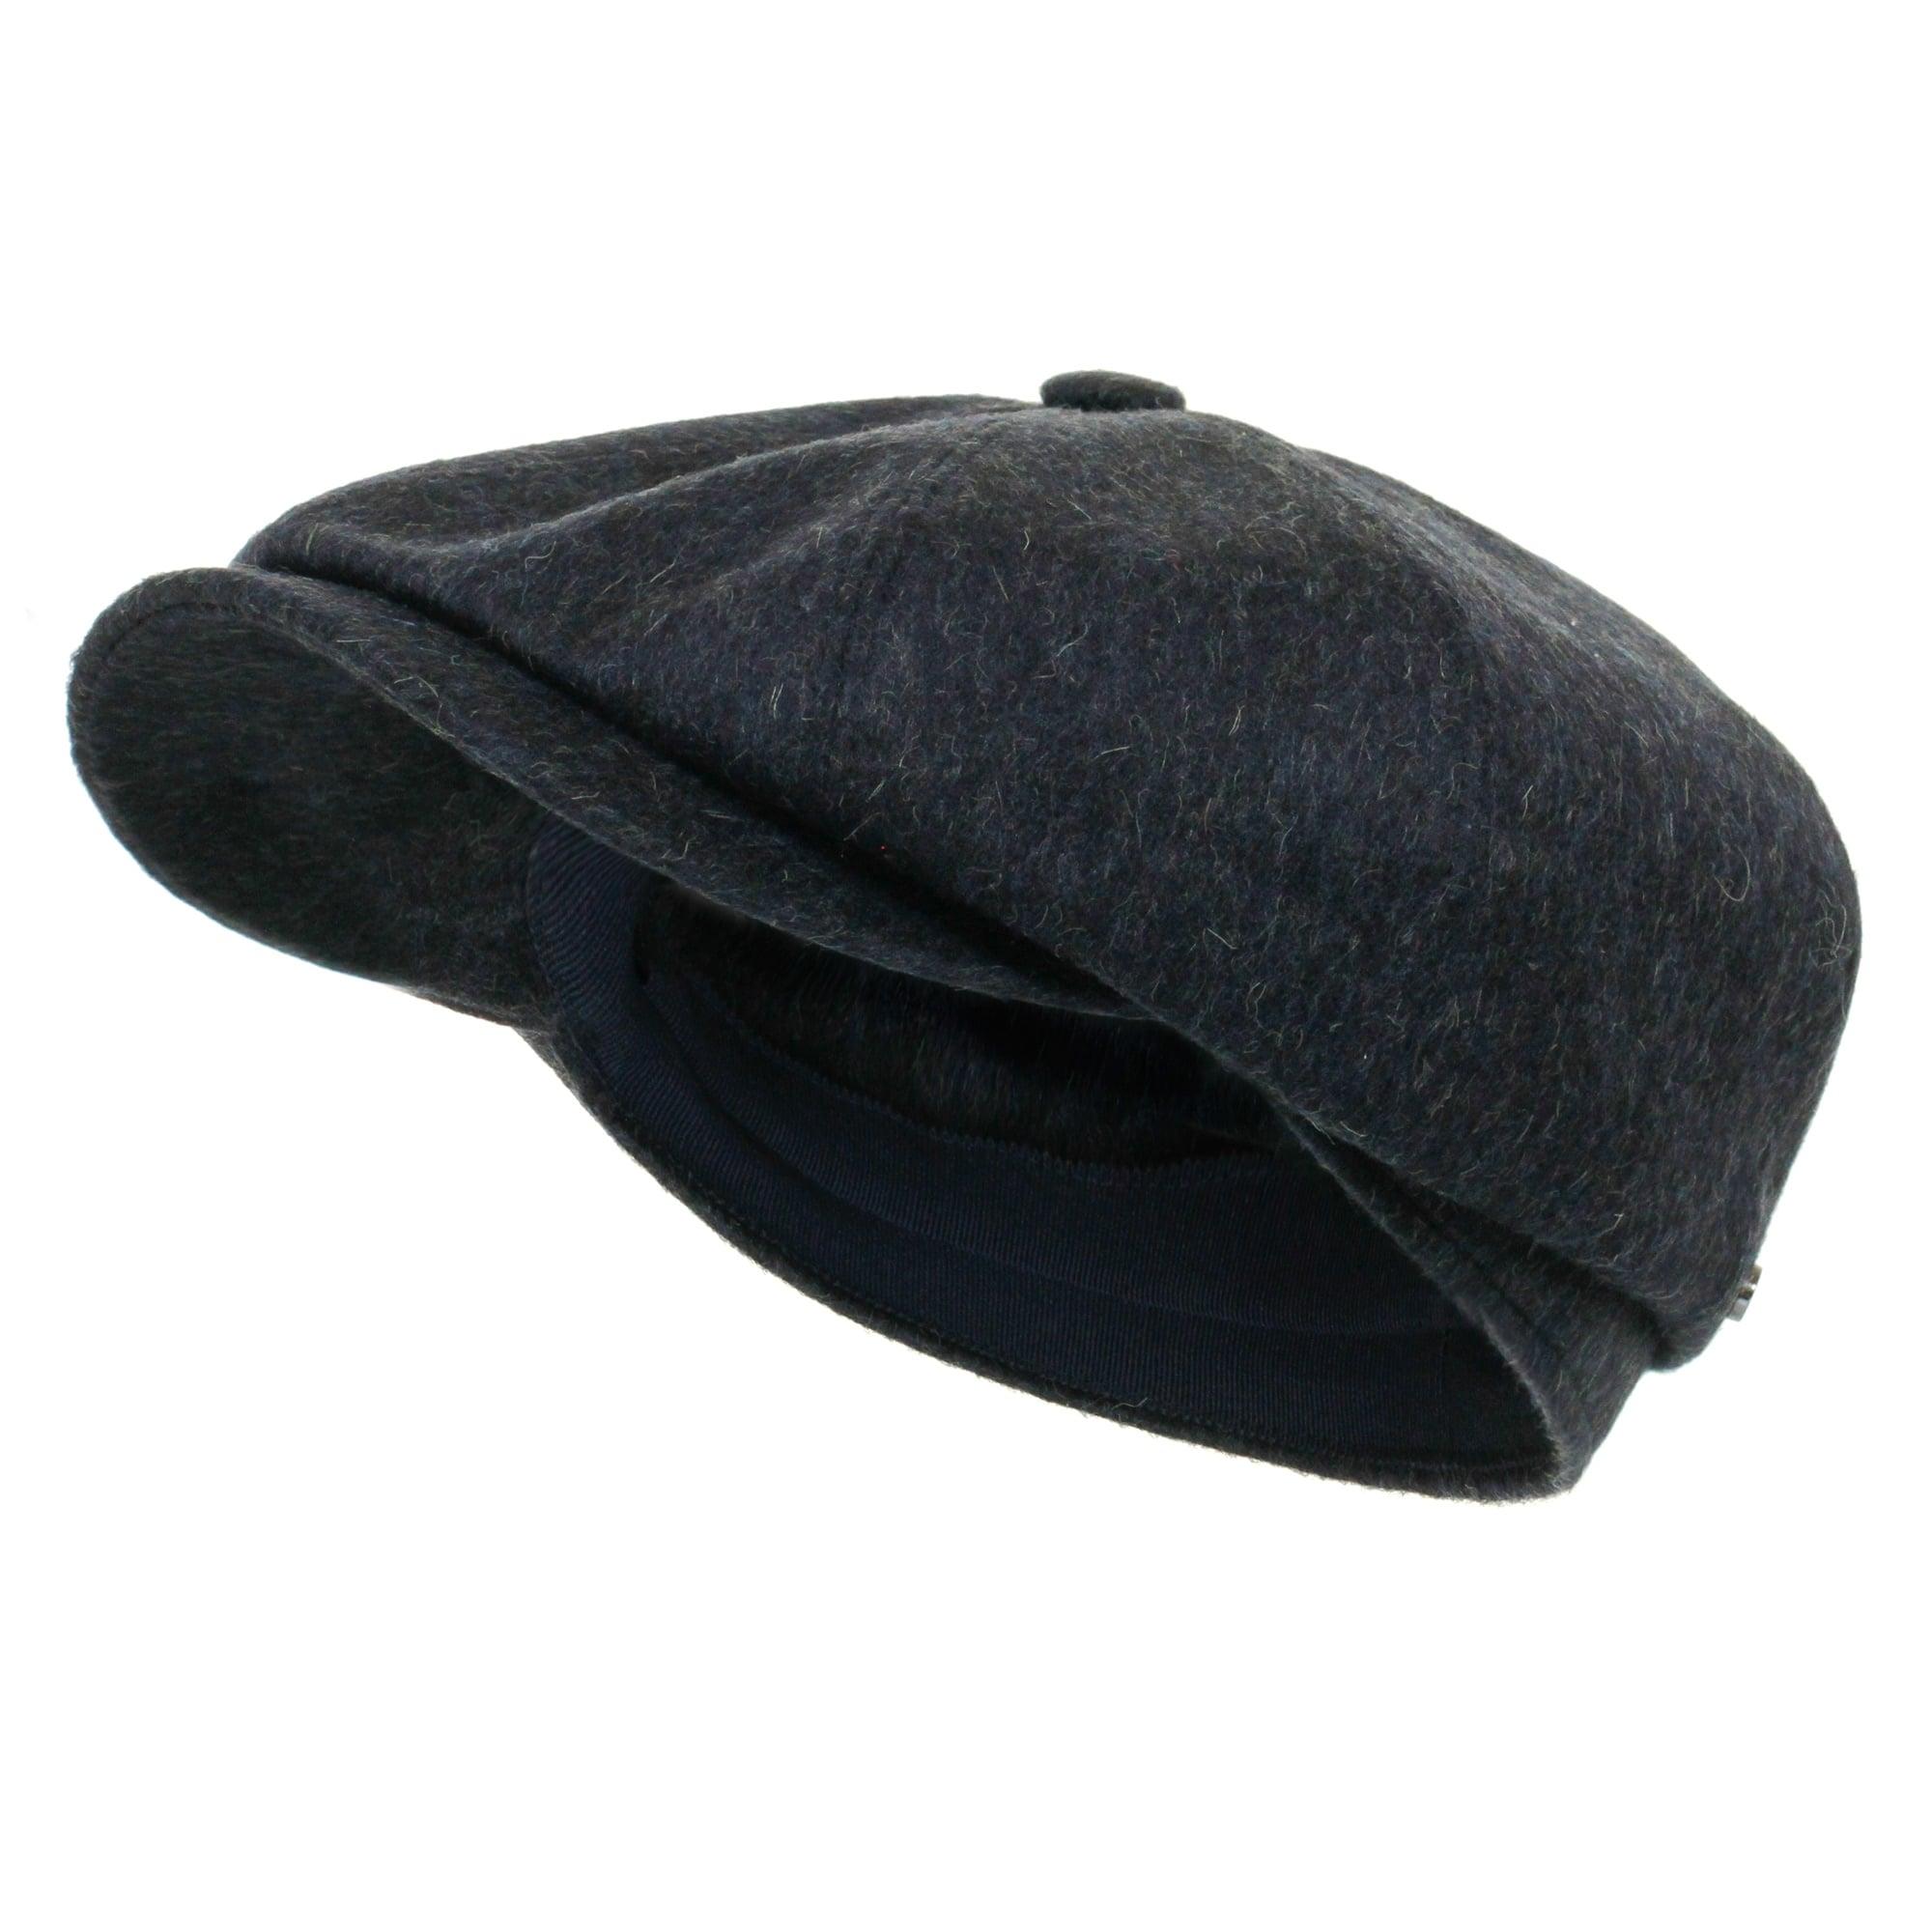 e013da4fb2a ... promo code for hatteras tyrolean loden flat cap navy 446ac 5ef9a